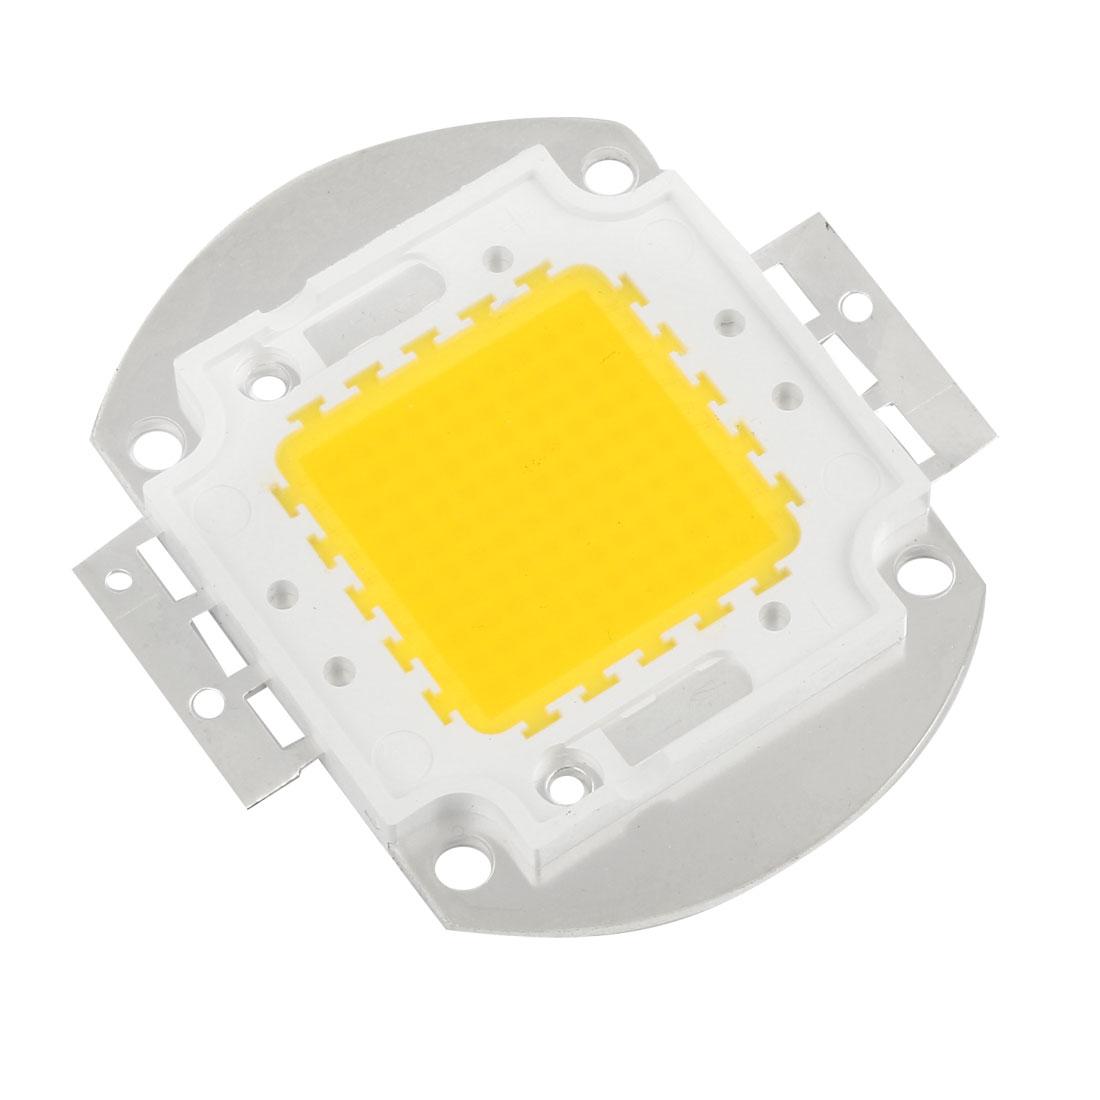 32-34V 3000mA 100W Warm White Light High Power SMD LED Chip Lamp Bulb